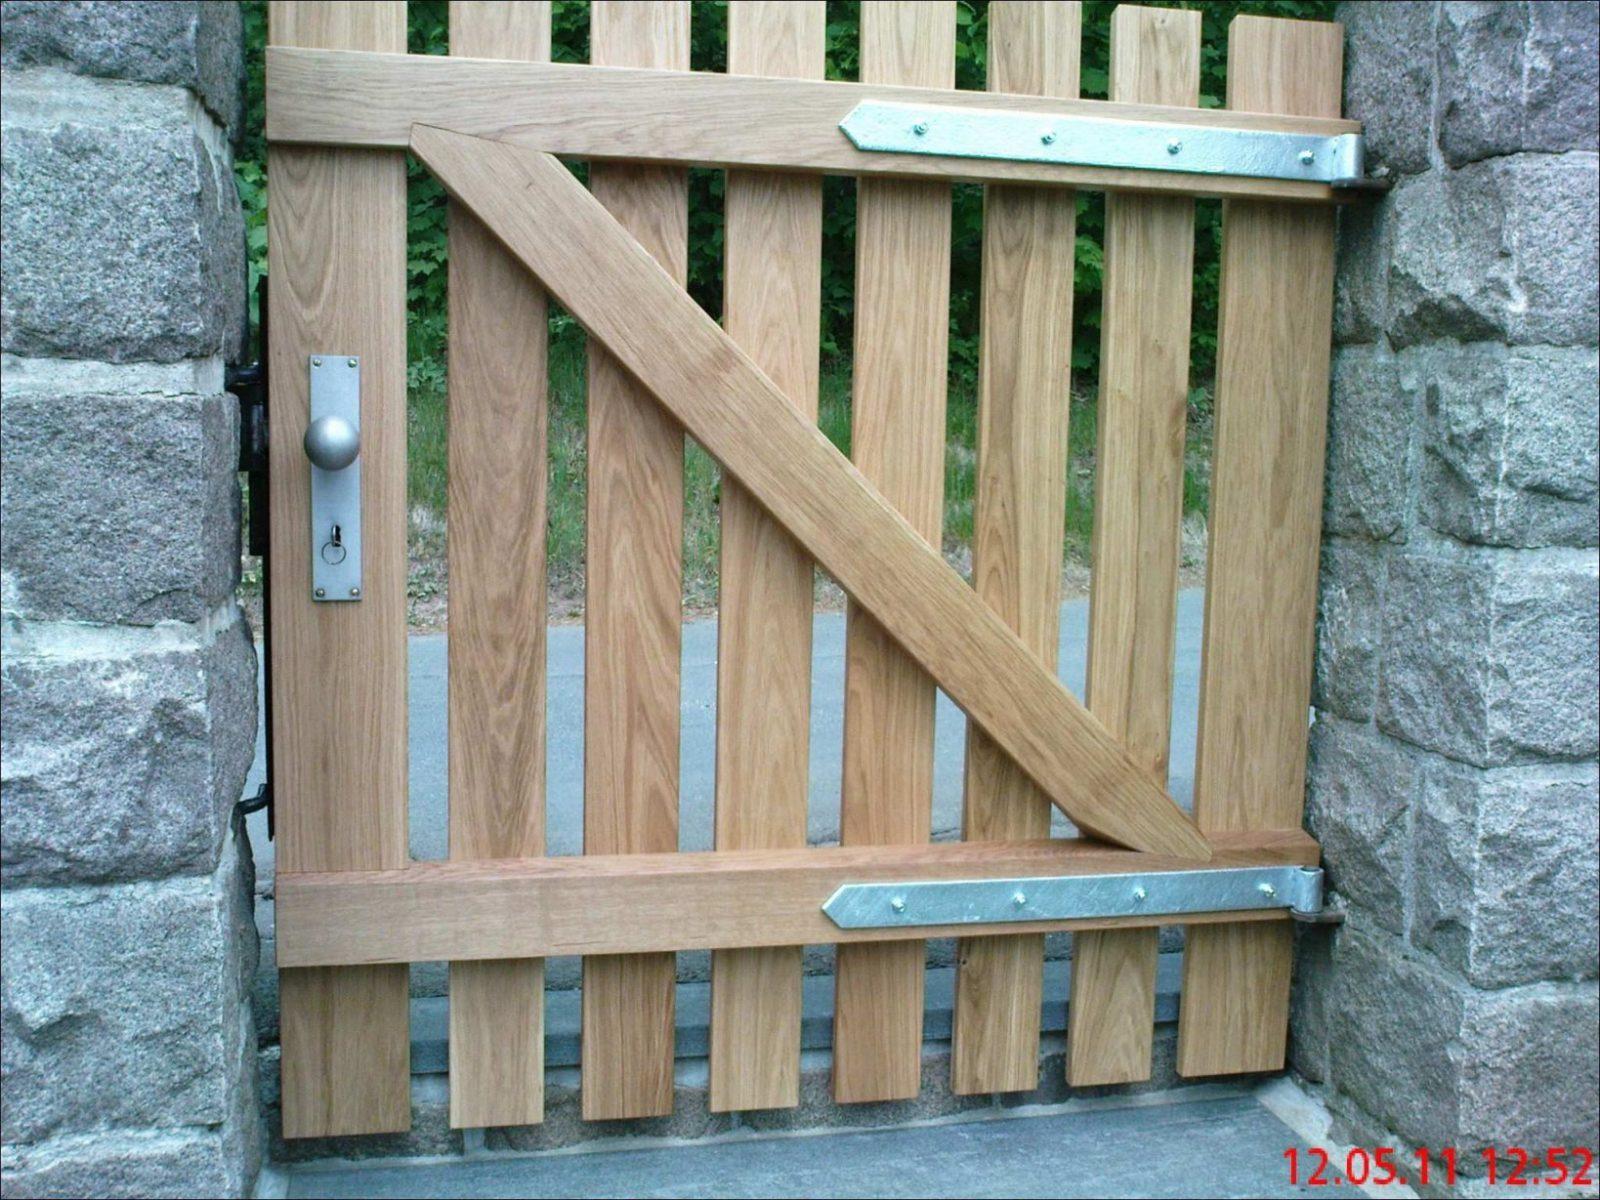 Gartentor Holz Selber Bauen Fotos Gartentor Selber Bauen Metall Für von Gartentor Aus Holz Selber Bauen Photo